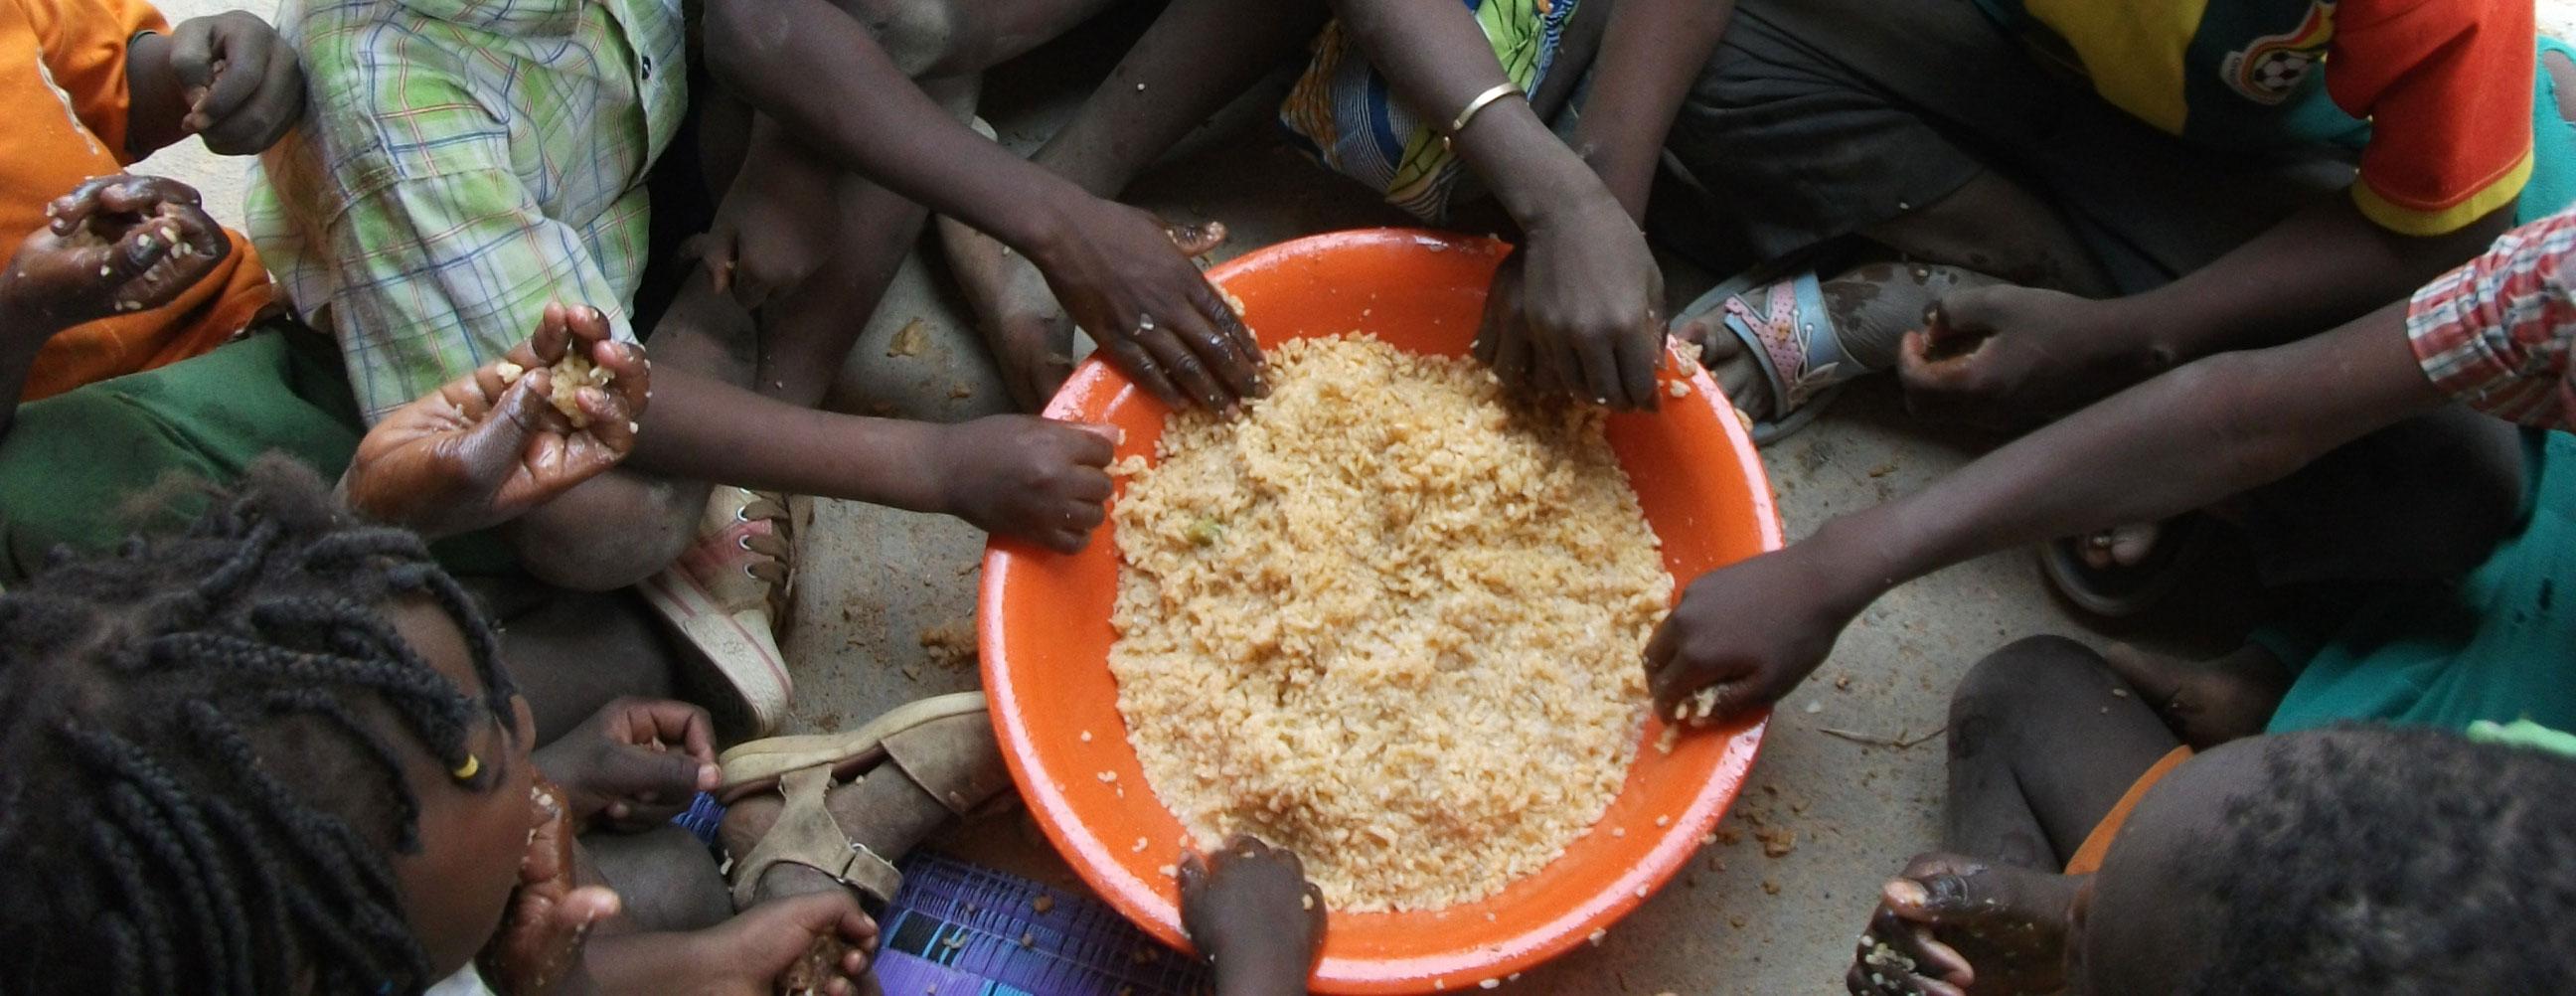 børn i Gorom-Gorom spiser